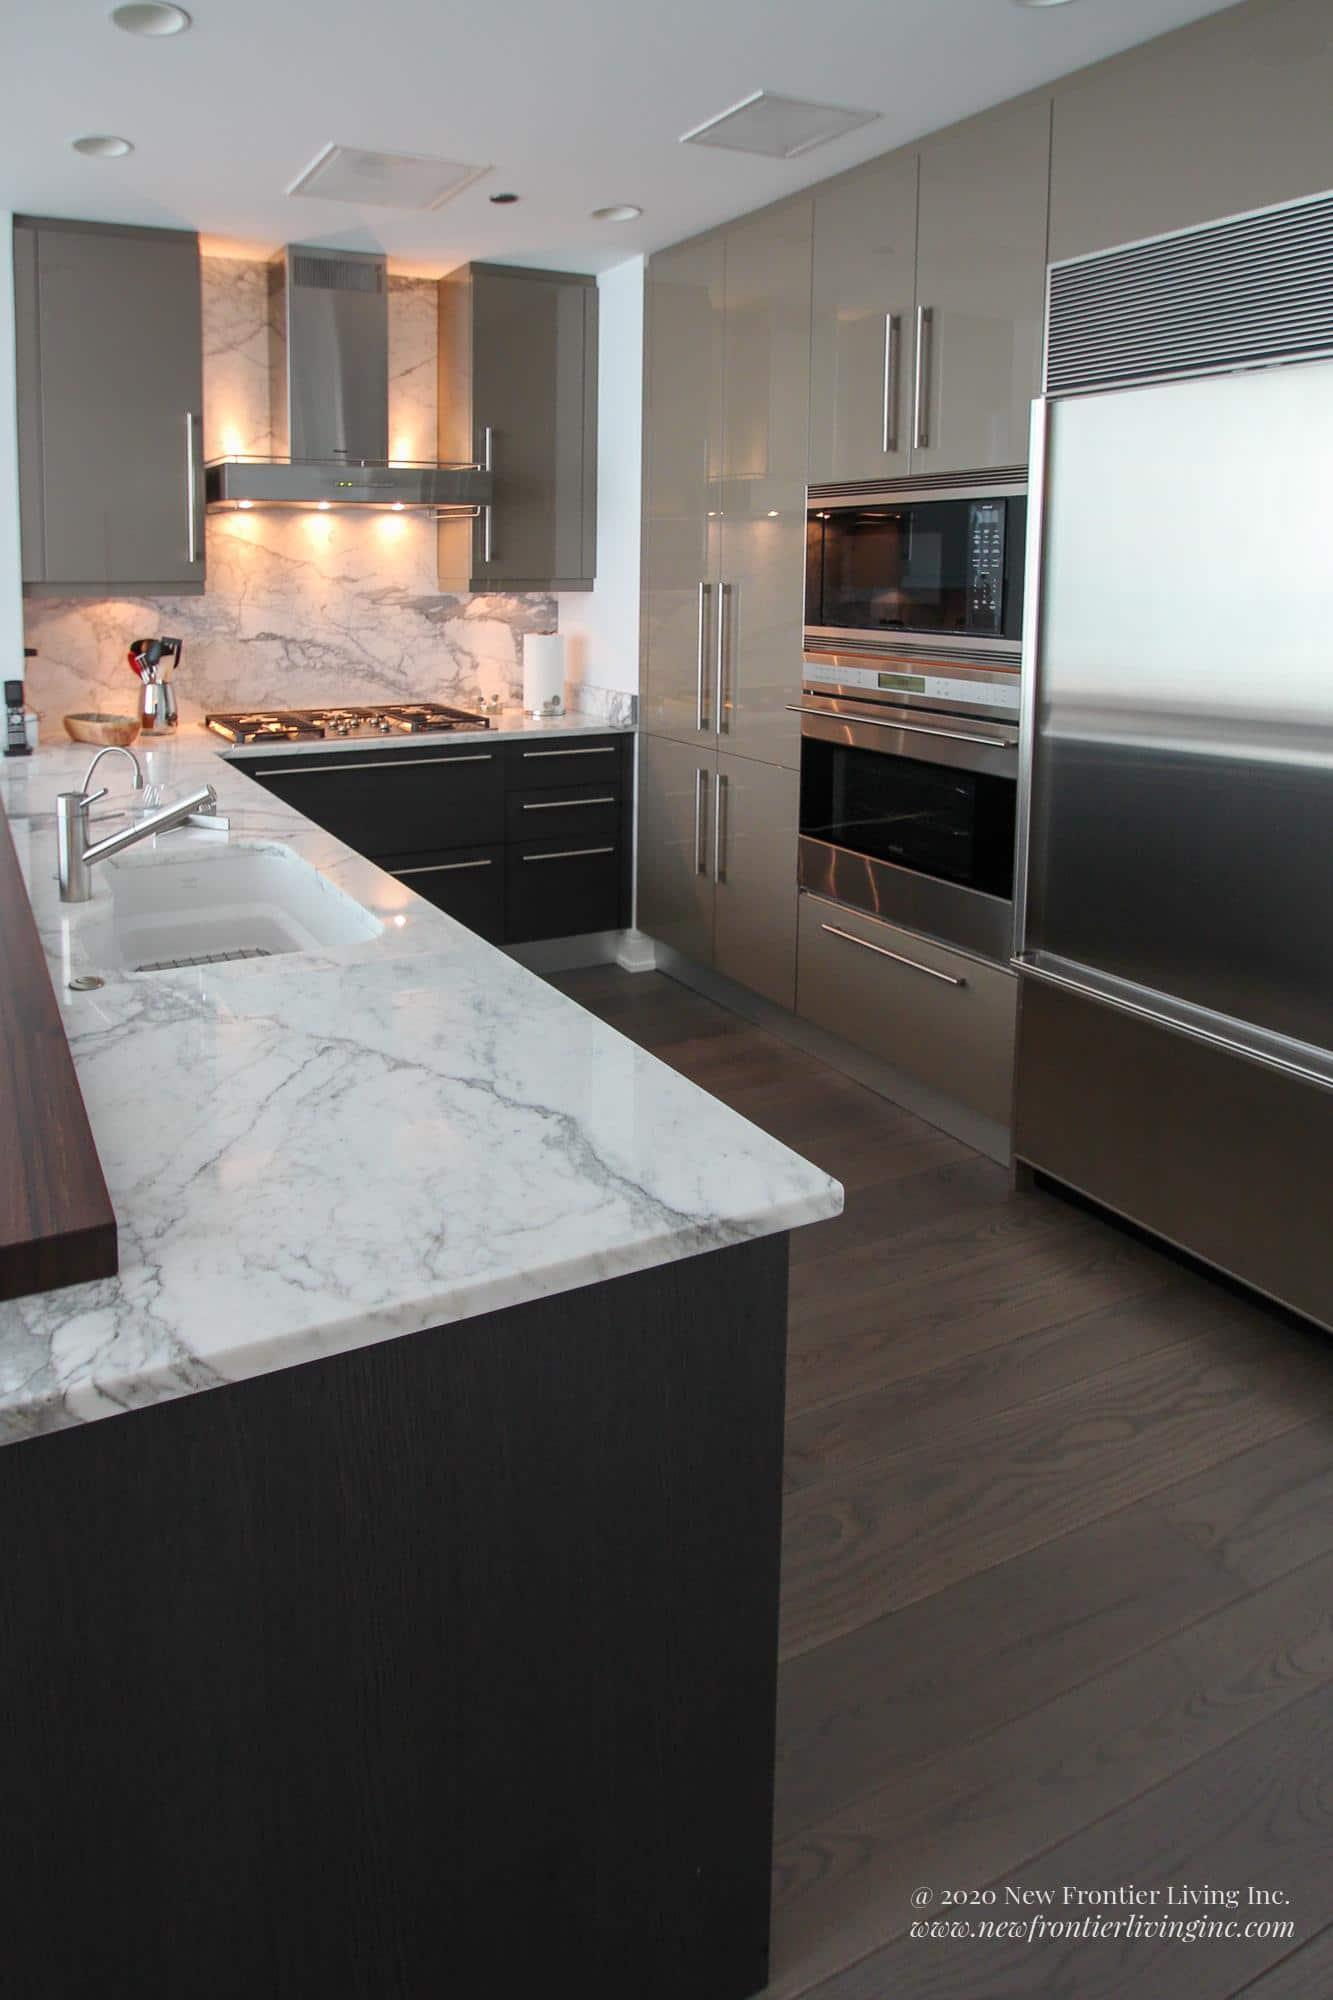 Dark gray kitchen with white granite countertop, dark floors and sink on the island